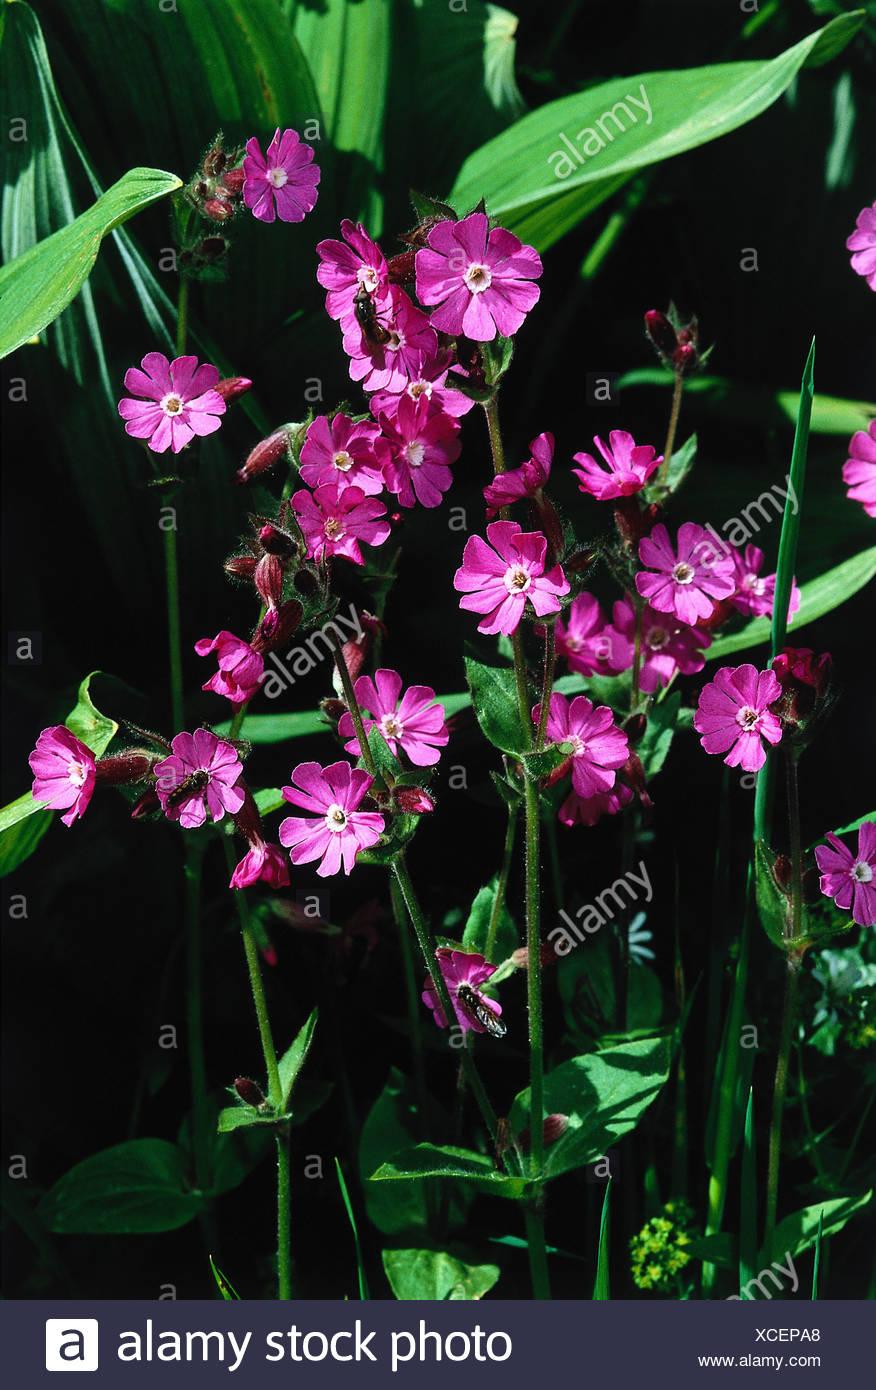 botany, Silene, (Melandrium), Red campion, (Melandrium rubrum), blossoms, Silena dioica, Melandrium rubrum, silvestre, diurnum, Stock Photo